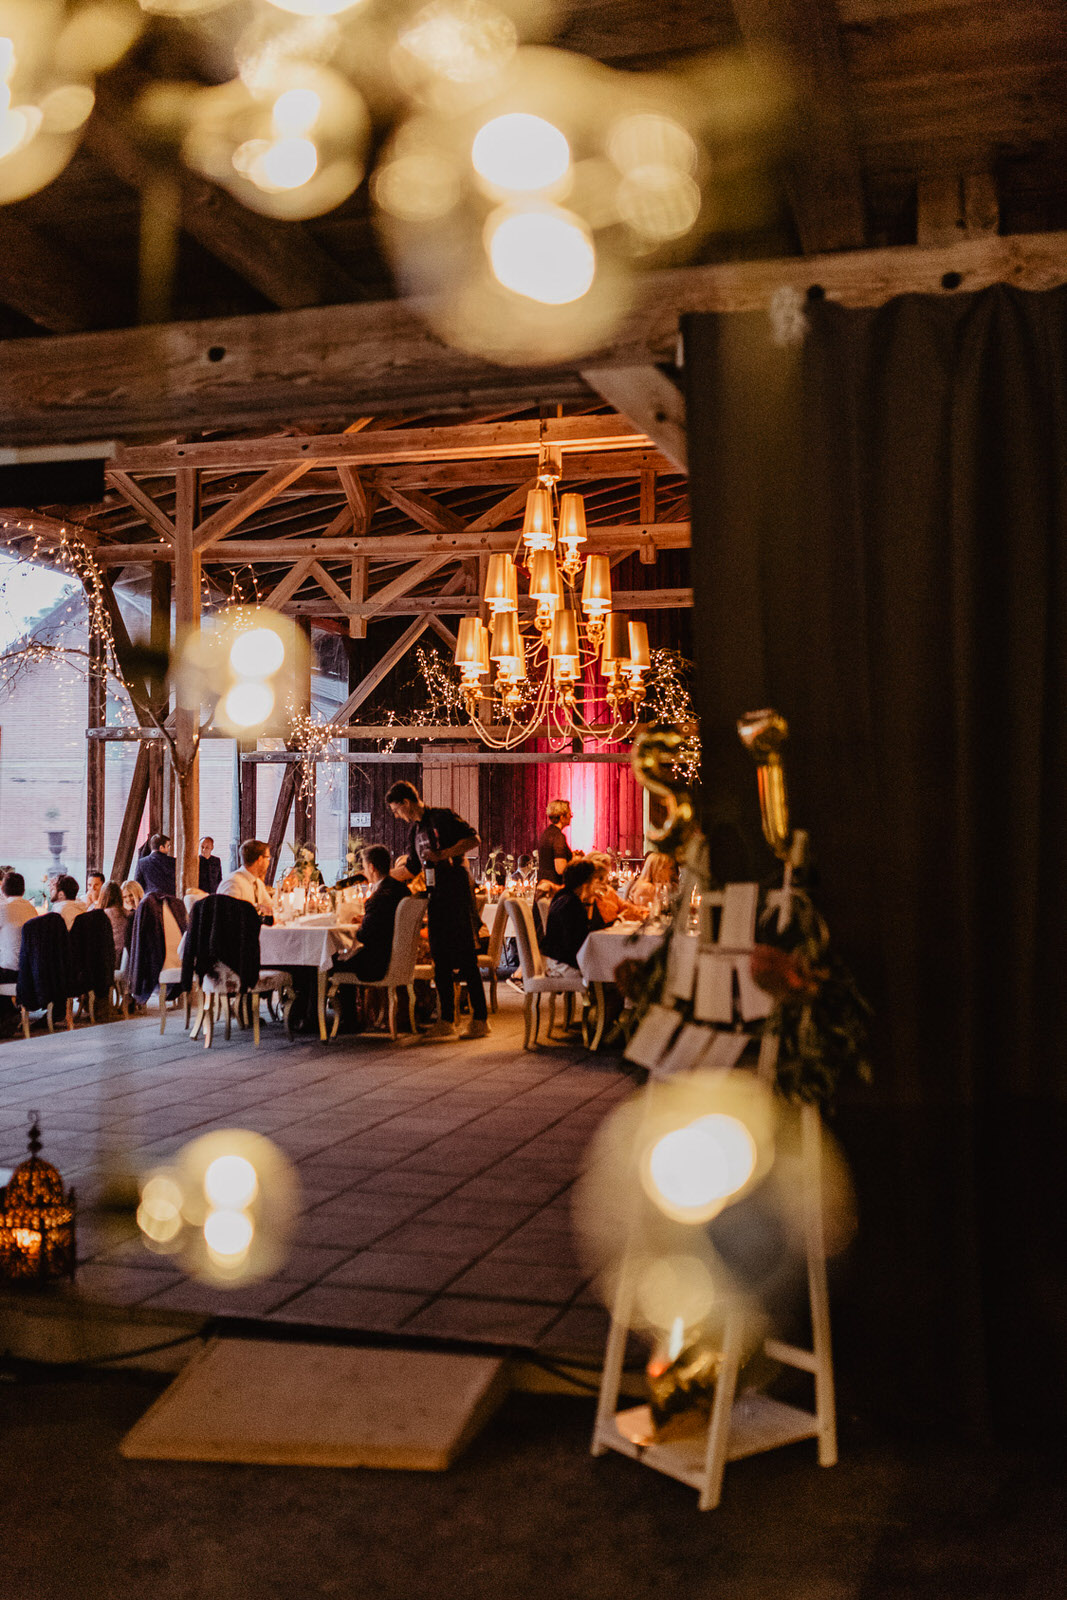 Christina-Hohner_Photography_Hochzeitslocation_Magical-Homes_Heroldstatt-59-von-65.jpg